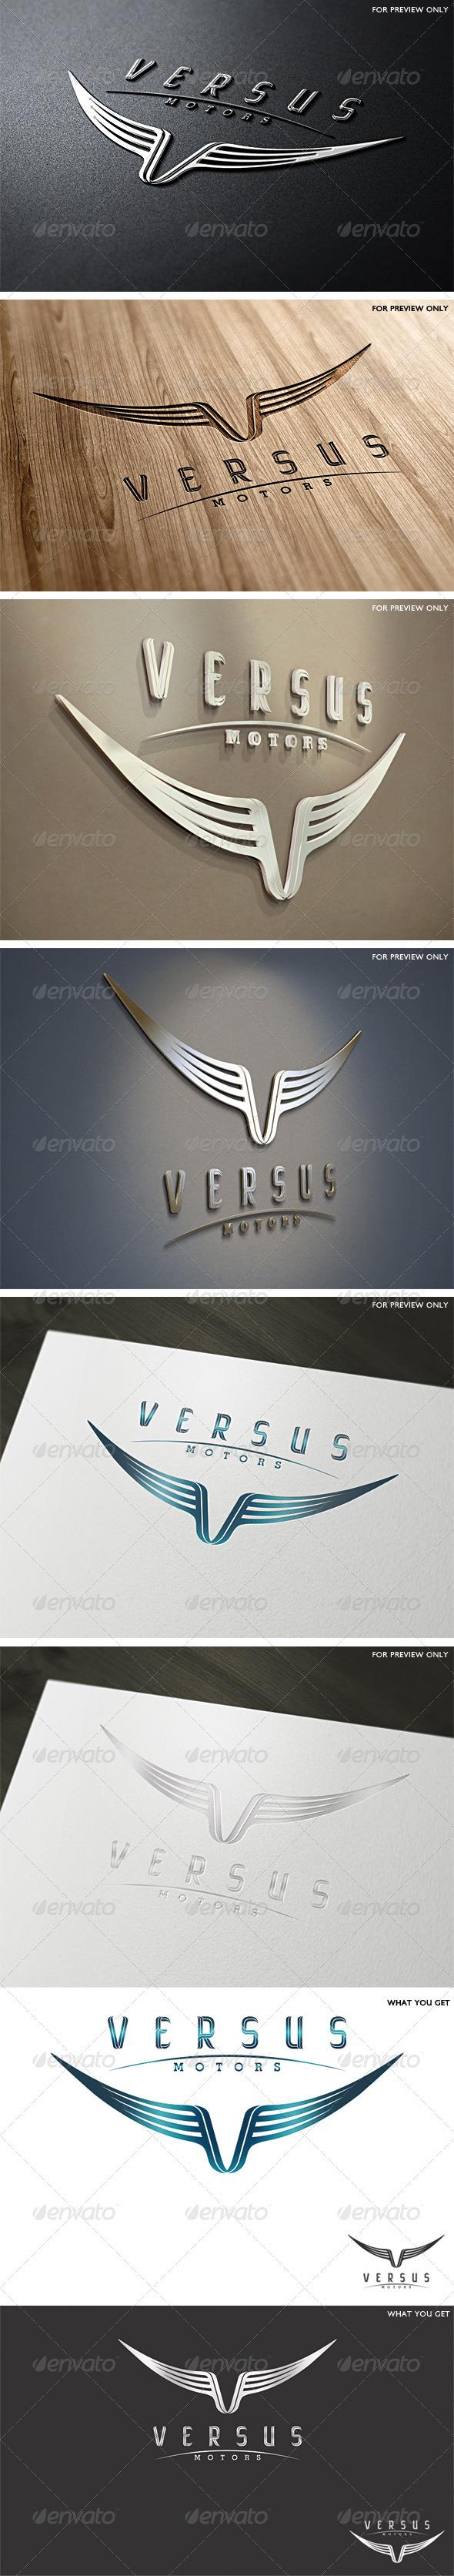 Versus Motors Logo Template - Letters Logo Templates